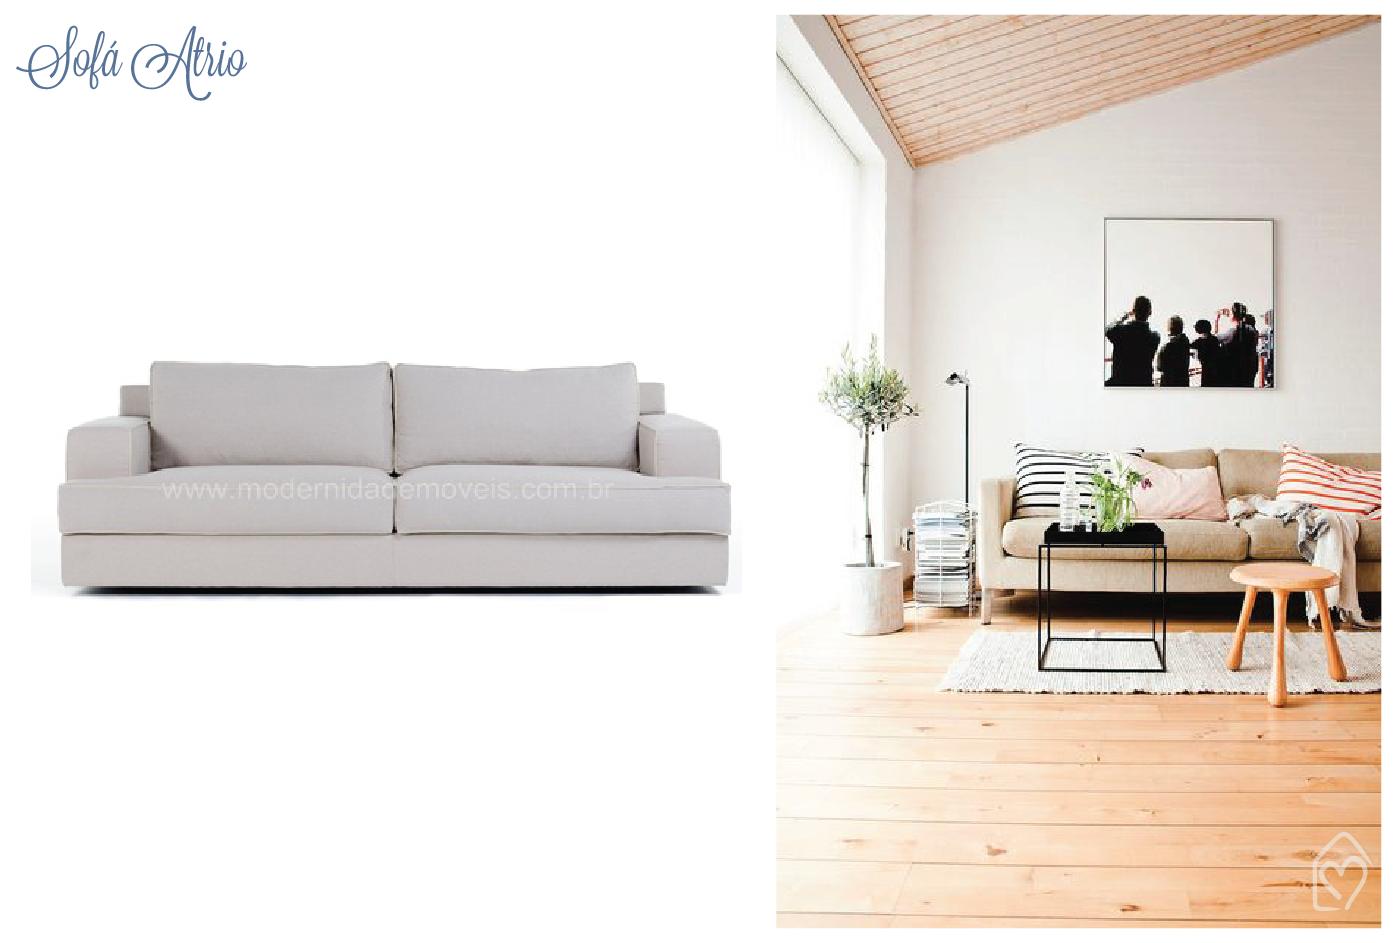 casa das amigas sof s para relaxar casa das amigas. Black Bedroom Furniture Sets. Home Design Ideas